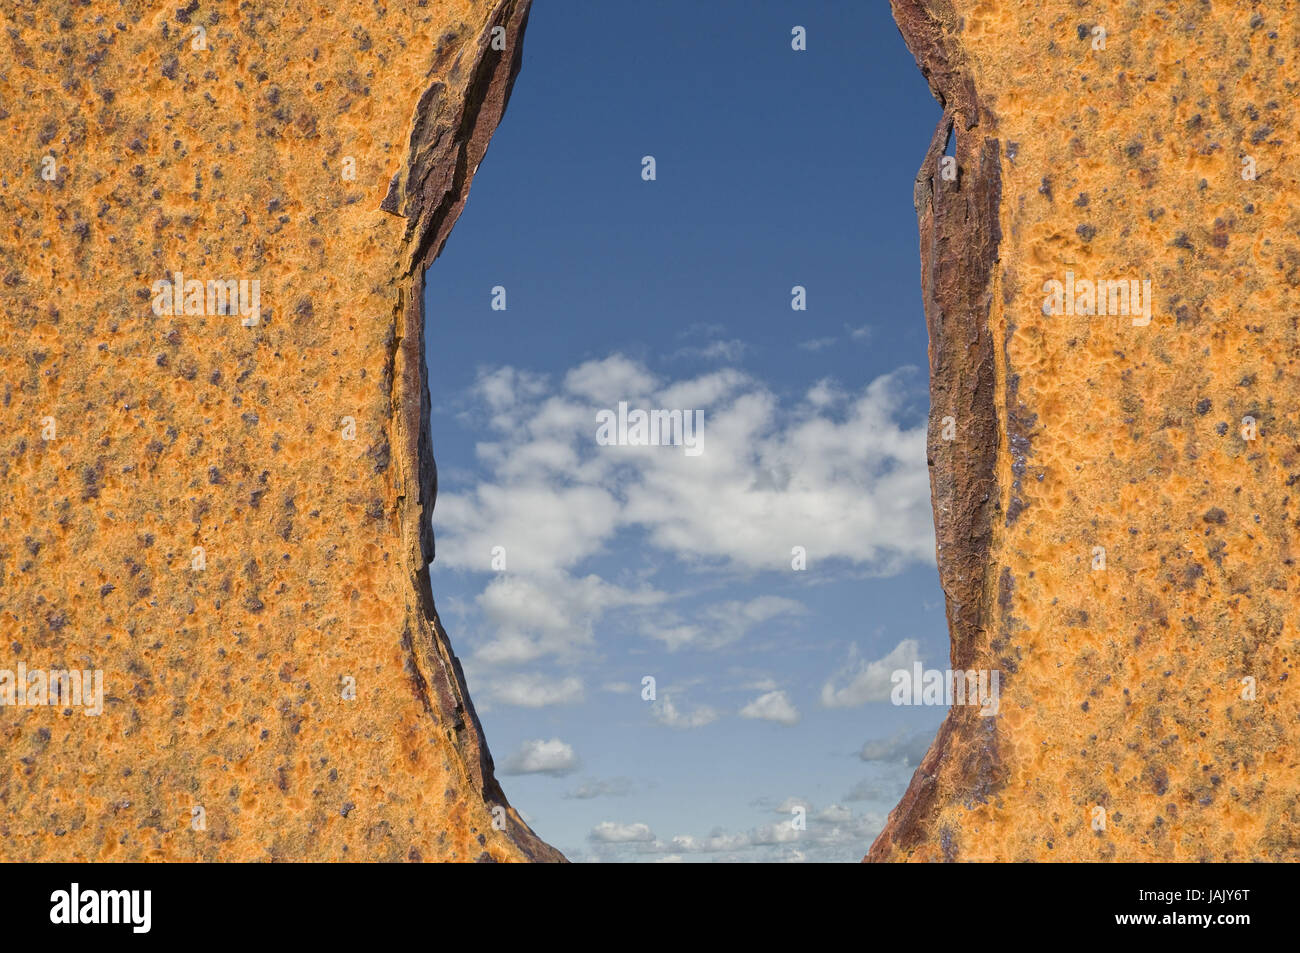 Conception,iron,rust,sample,orifice,view, - Stock Image